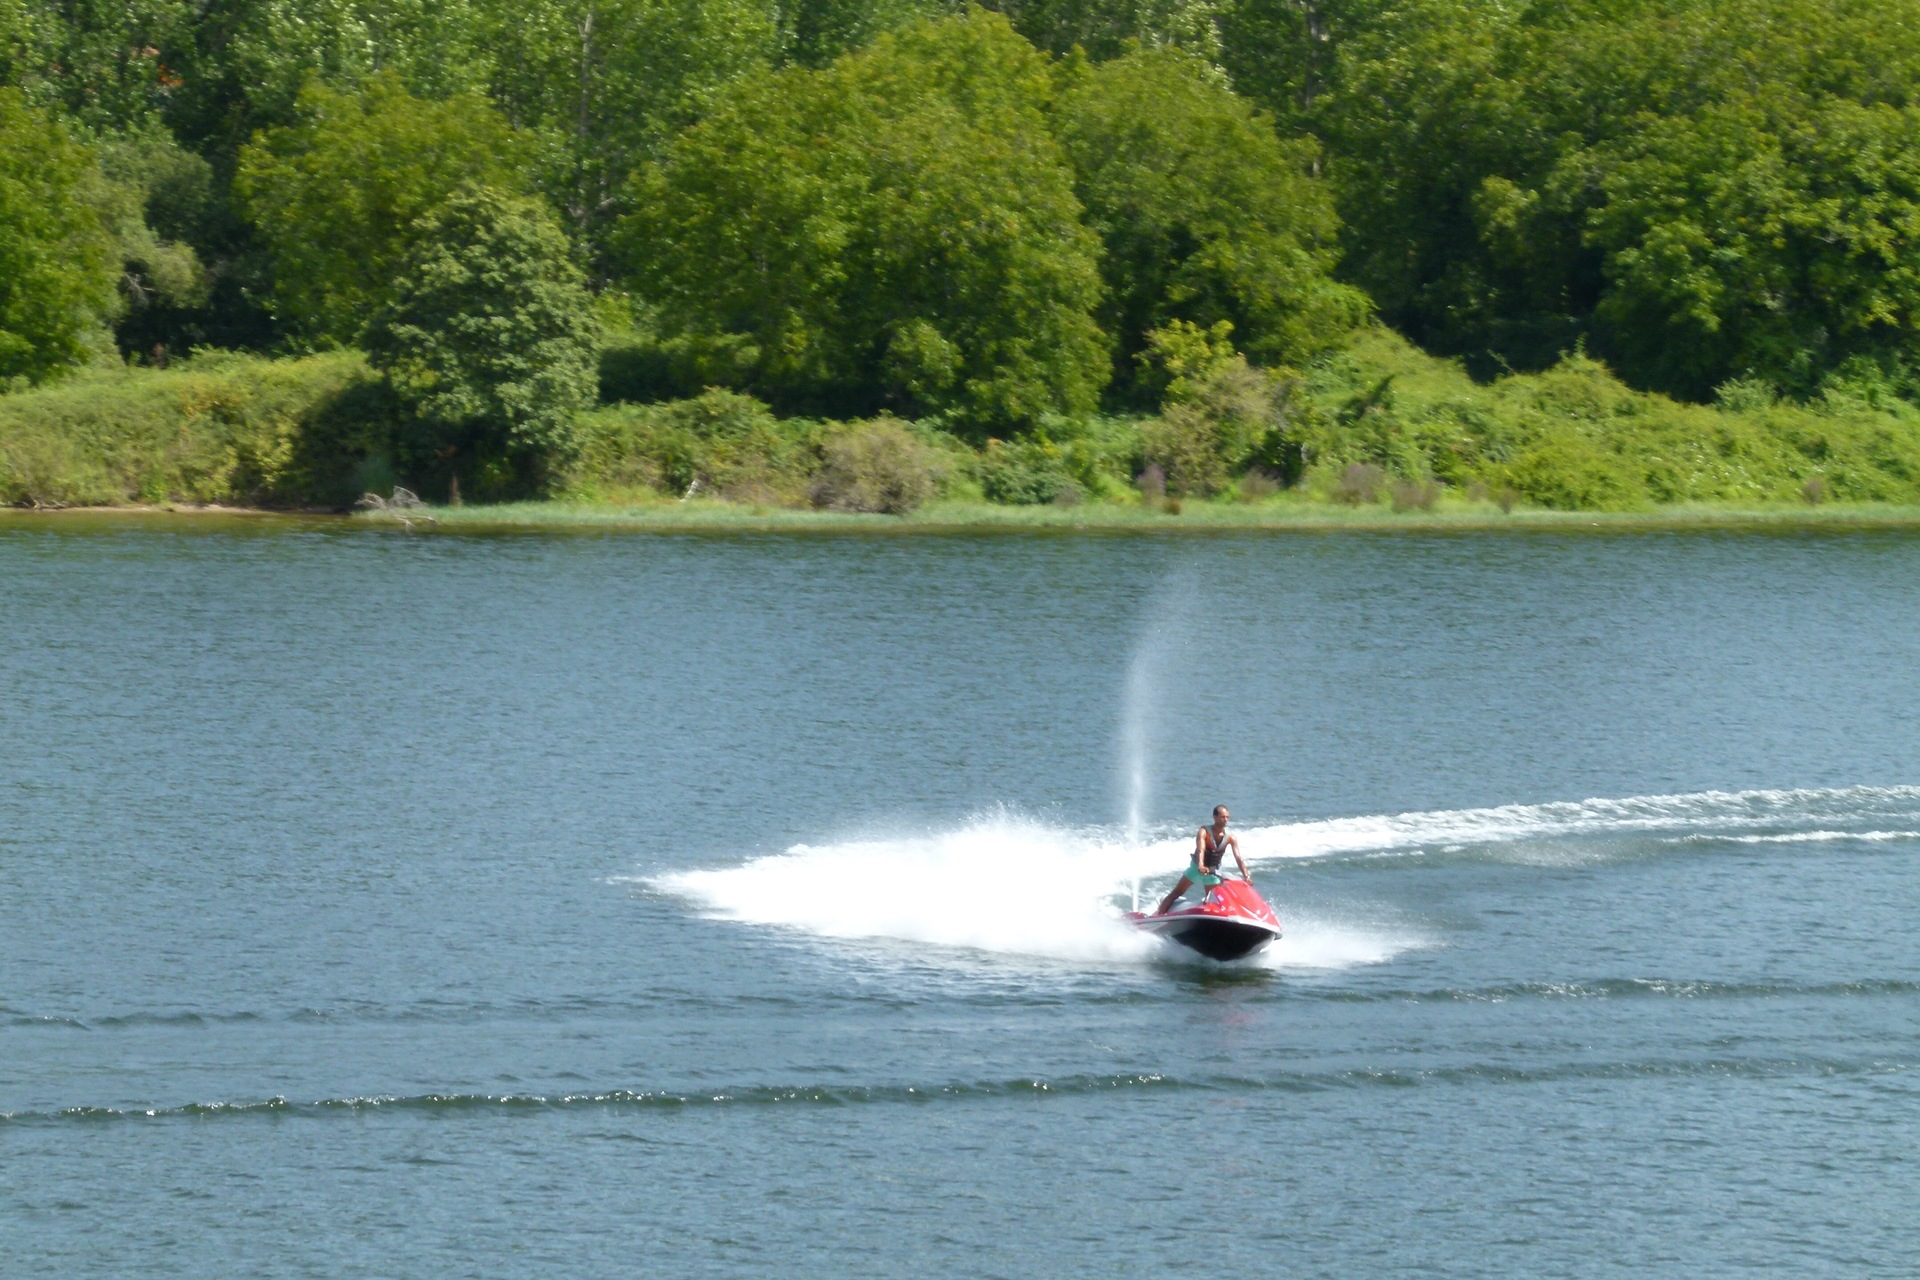 Drift | santoz1986, water, river, recreation